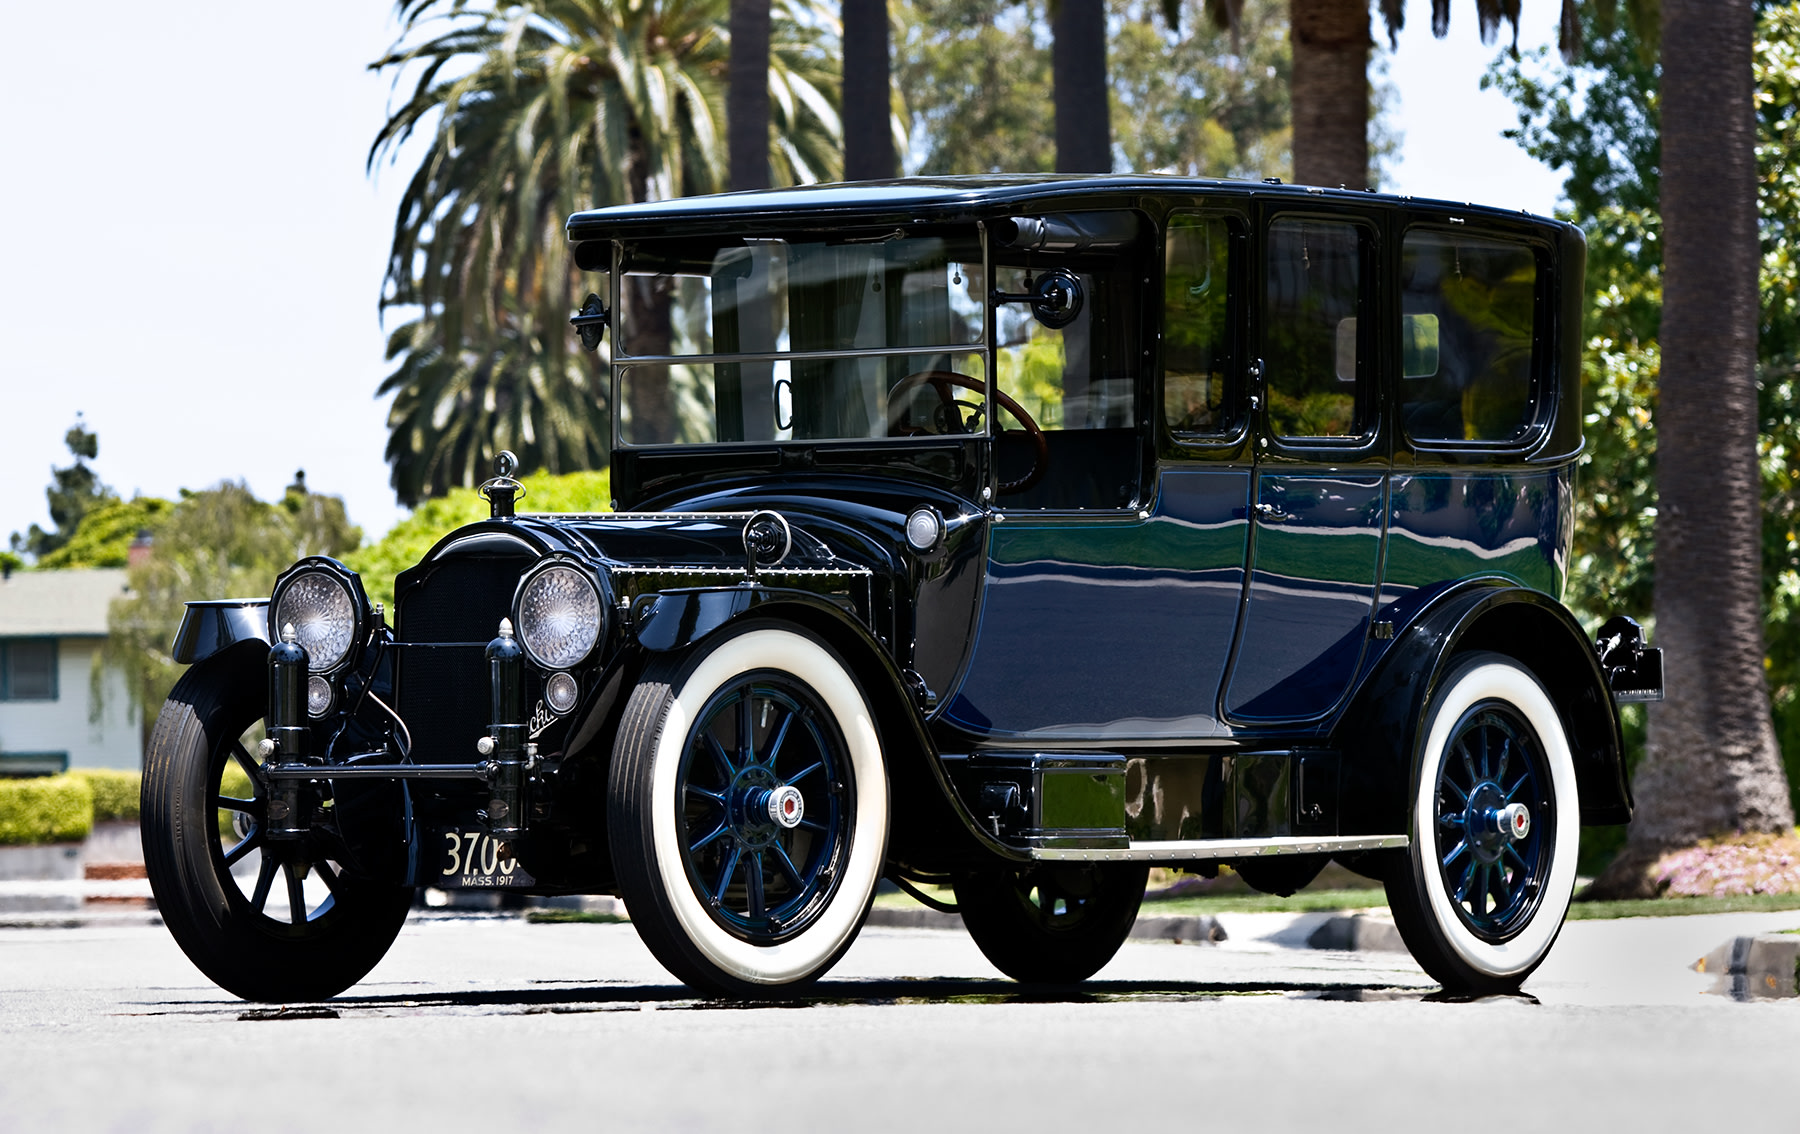 1917 Packard Twin Six 2-35 All-Weather Landaulet